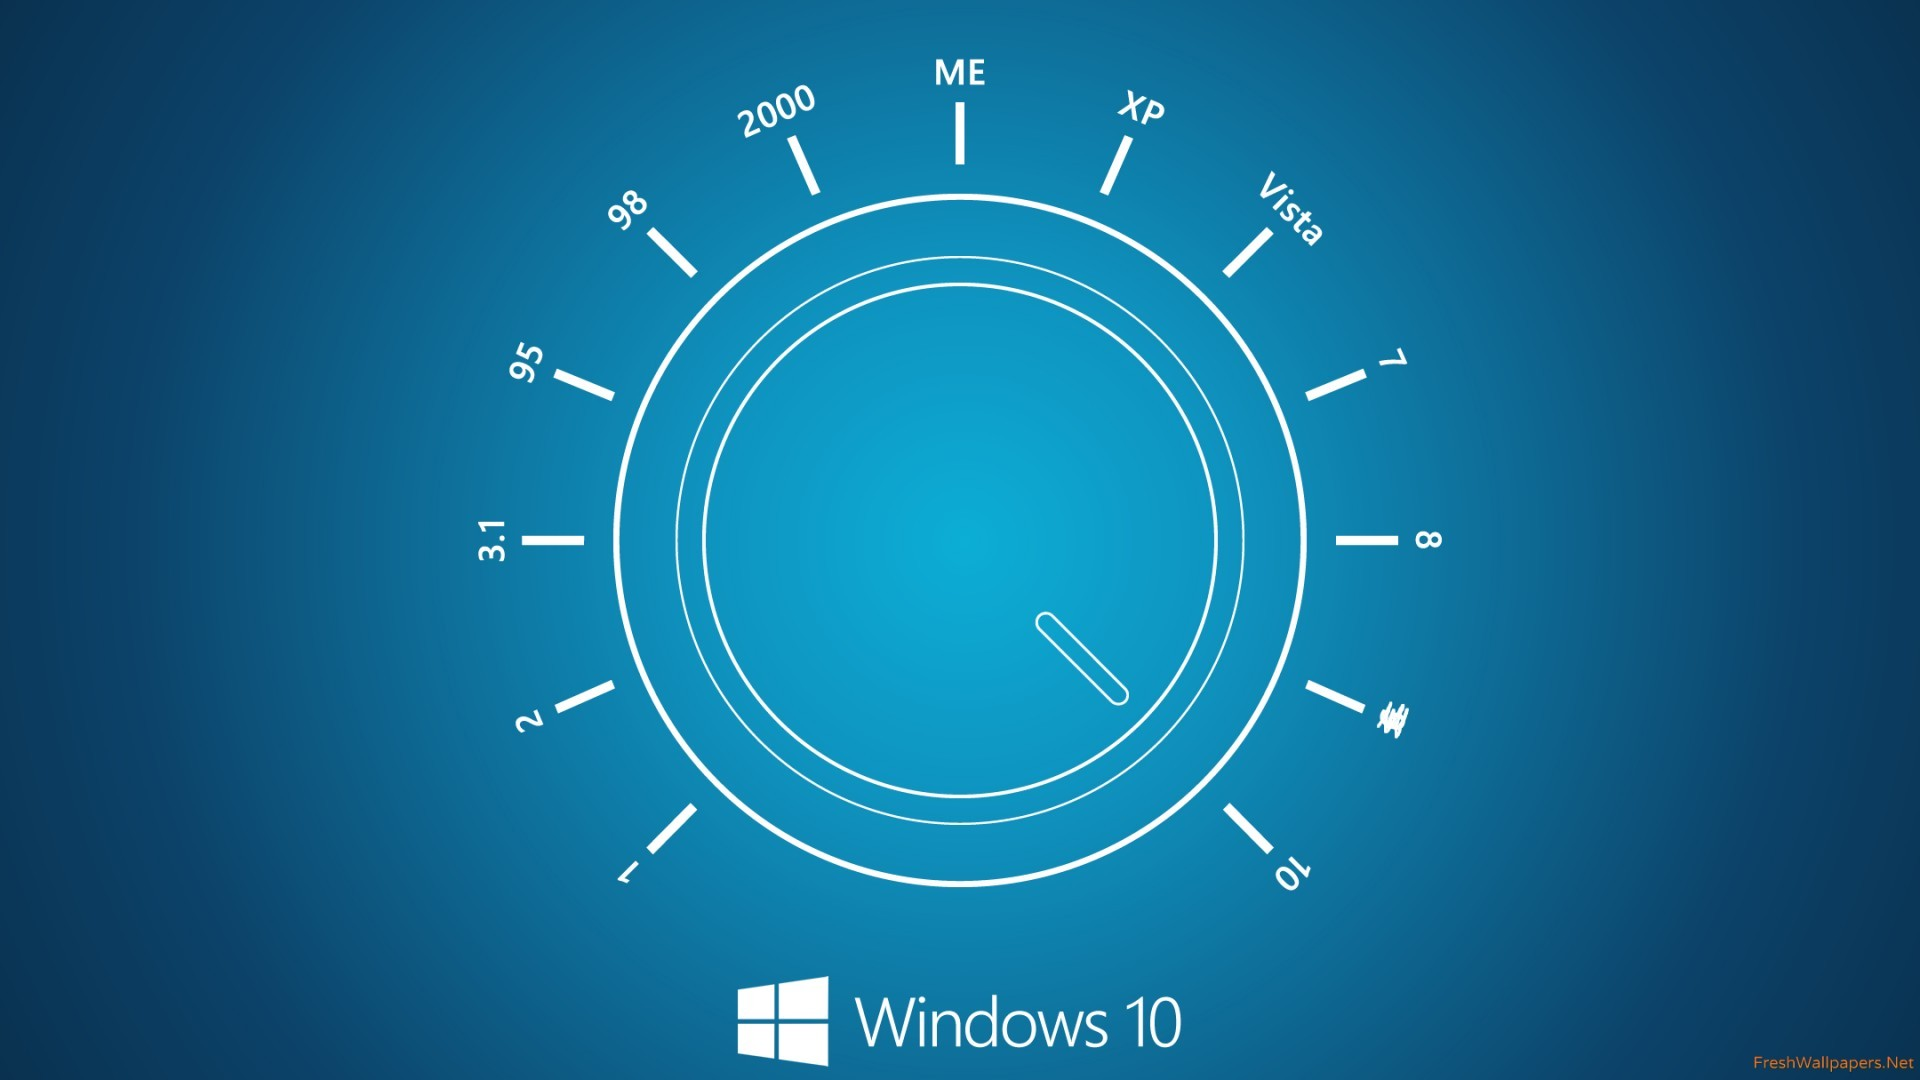 Windows 10 wallpaper HD 1080p ·① Download free beautiful ...